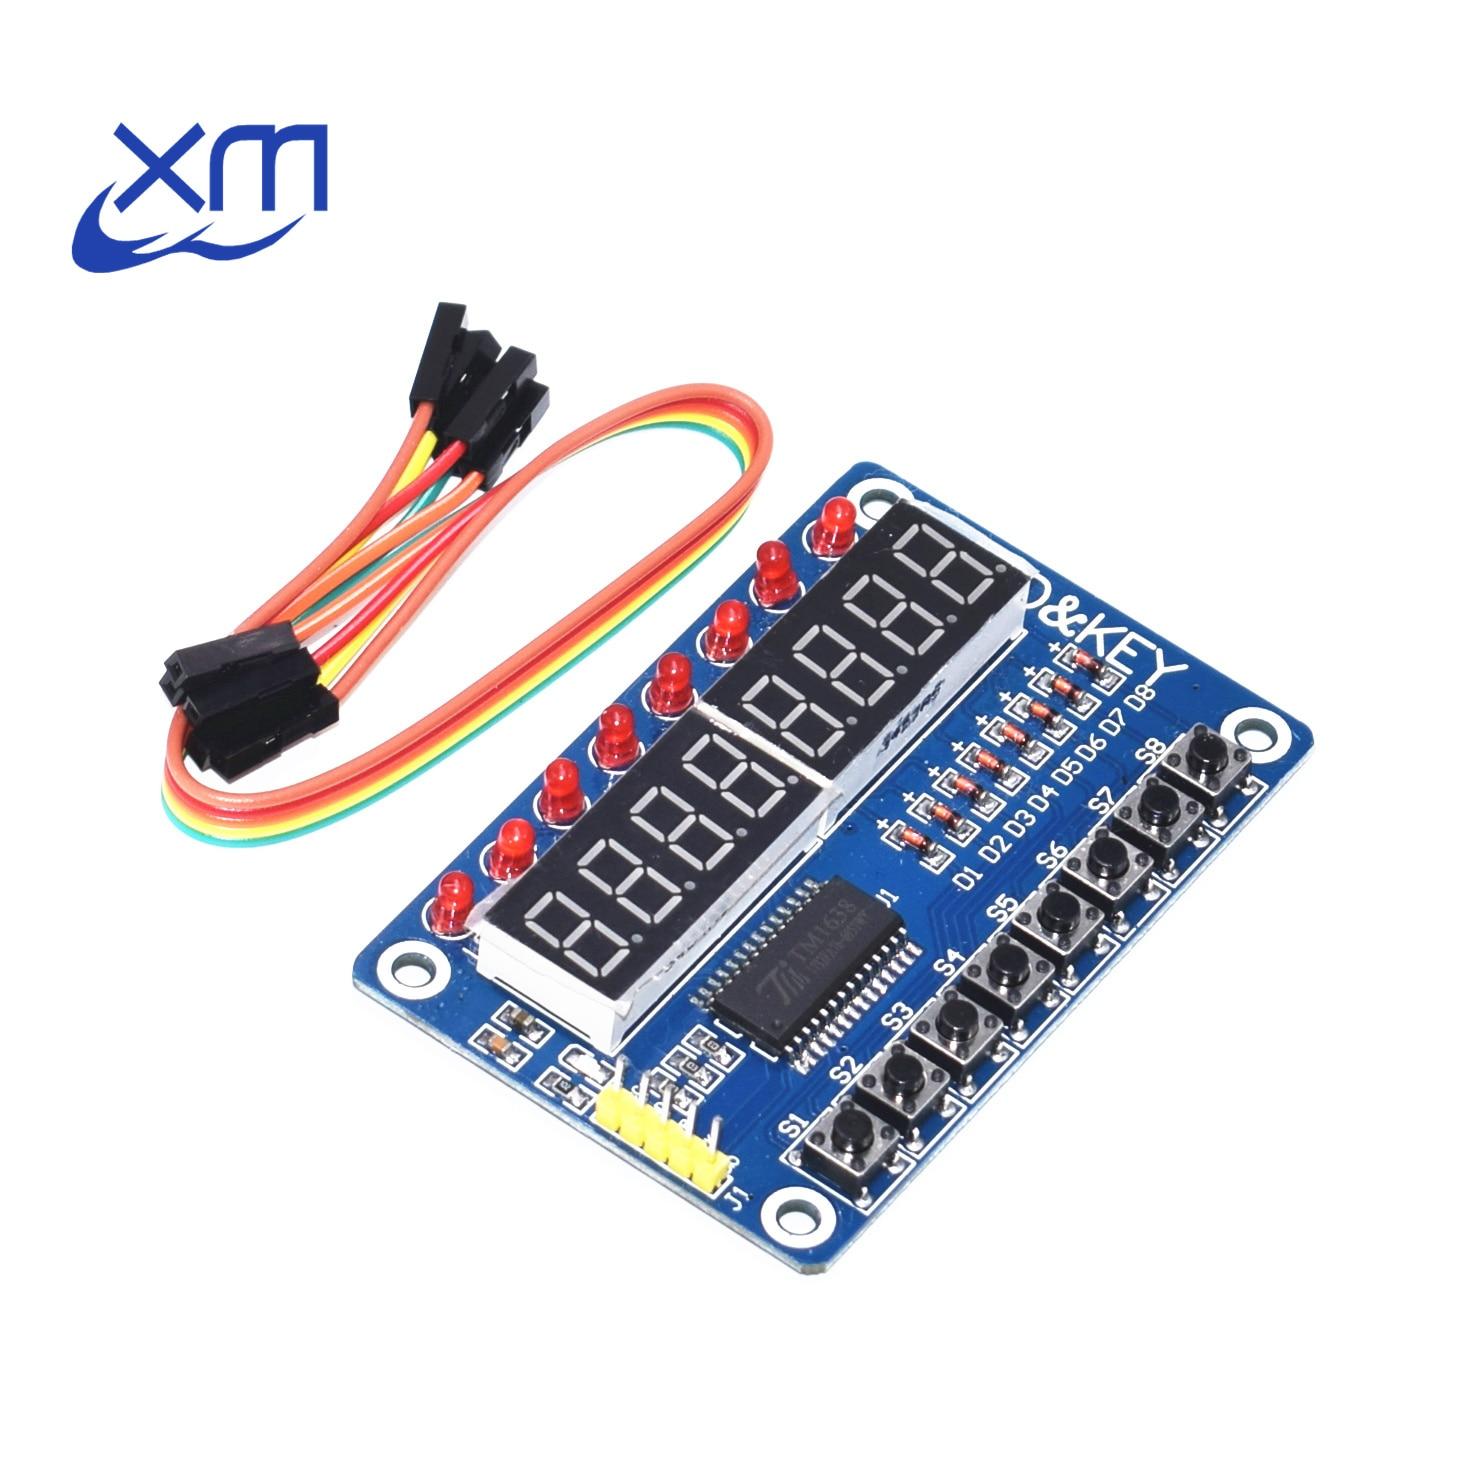 1pc Key Display New 8-Bit Digital LED Tube 8-Bit TM1638 Module D82(China)